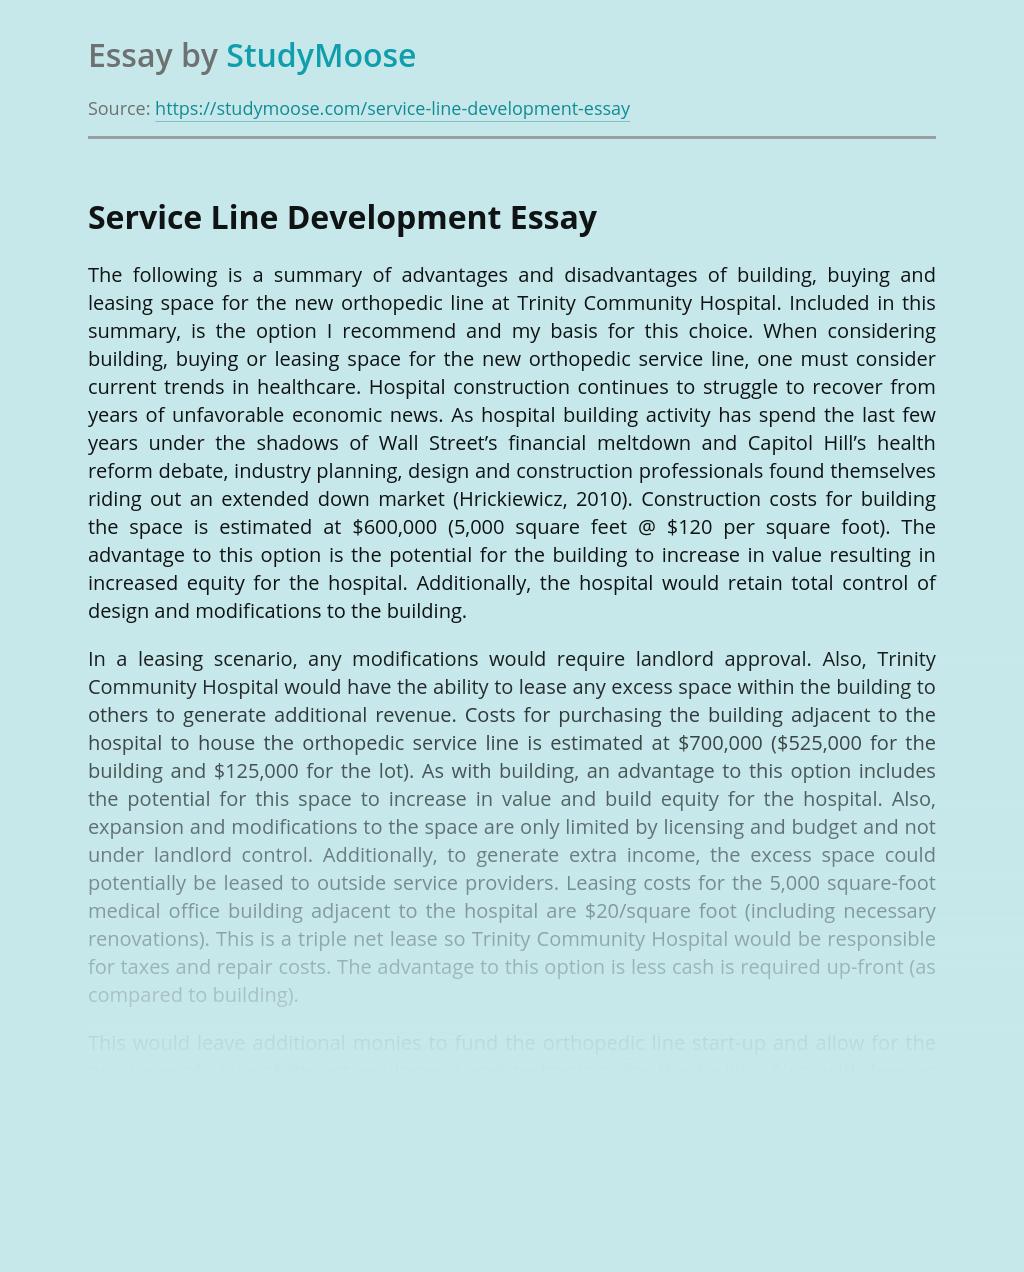 Service Line Development for Trinity Community Hospital